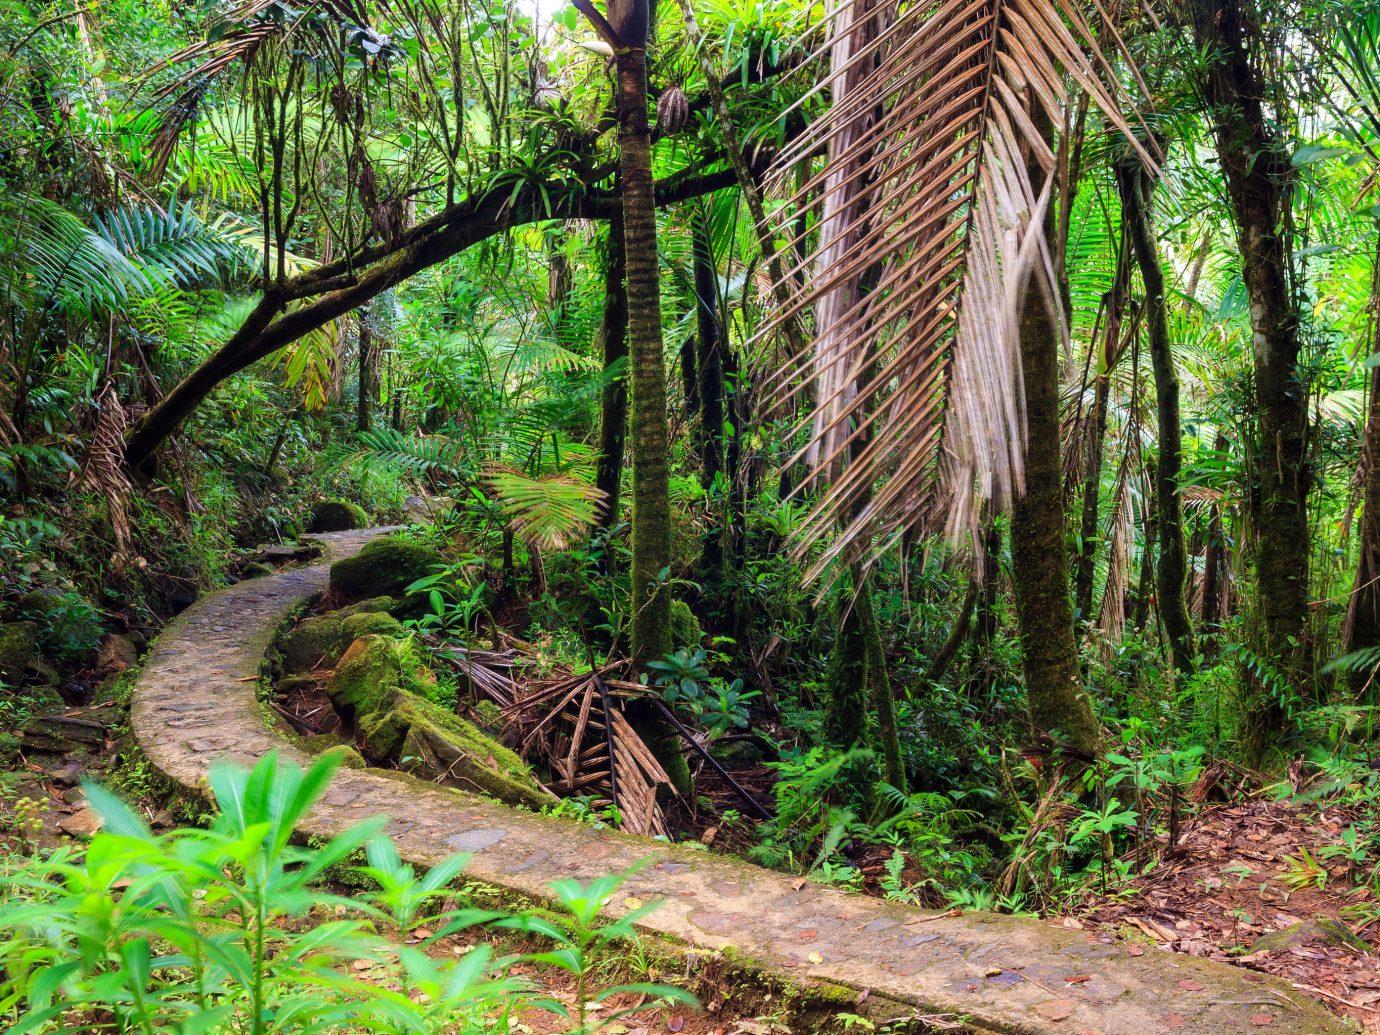 rainforest in San Juan, Puerto Rico